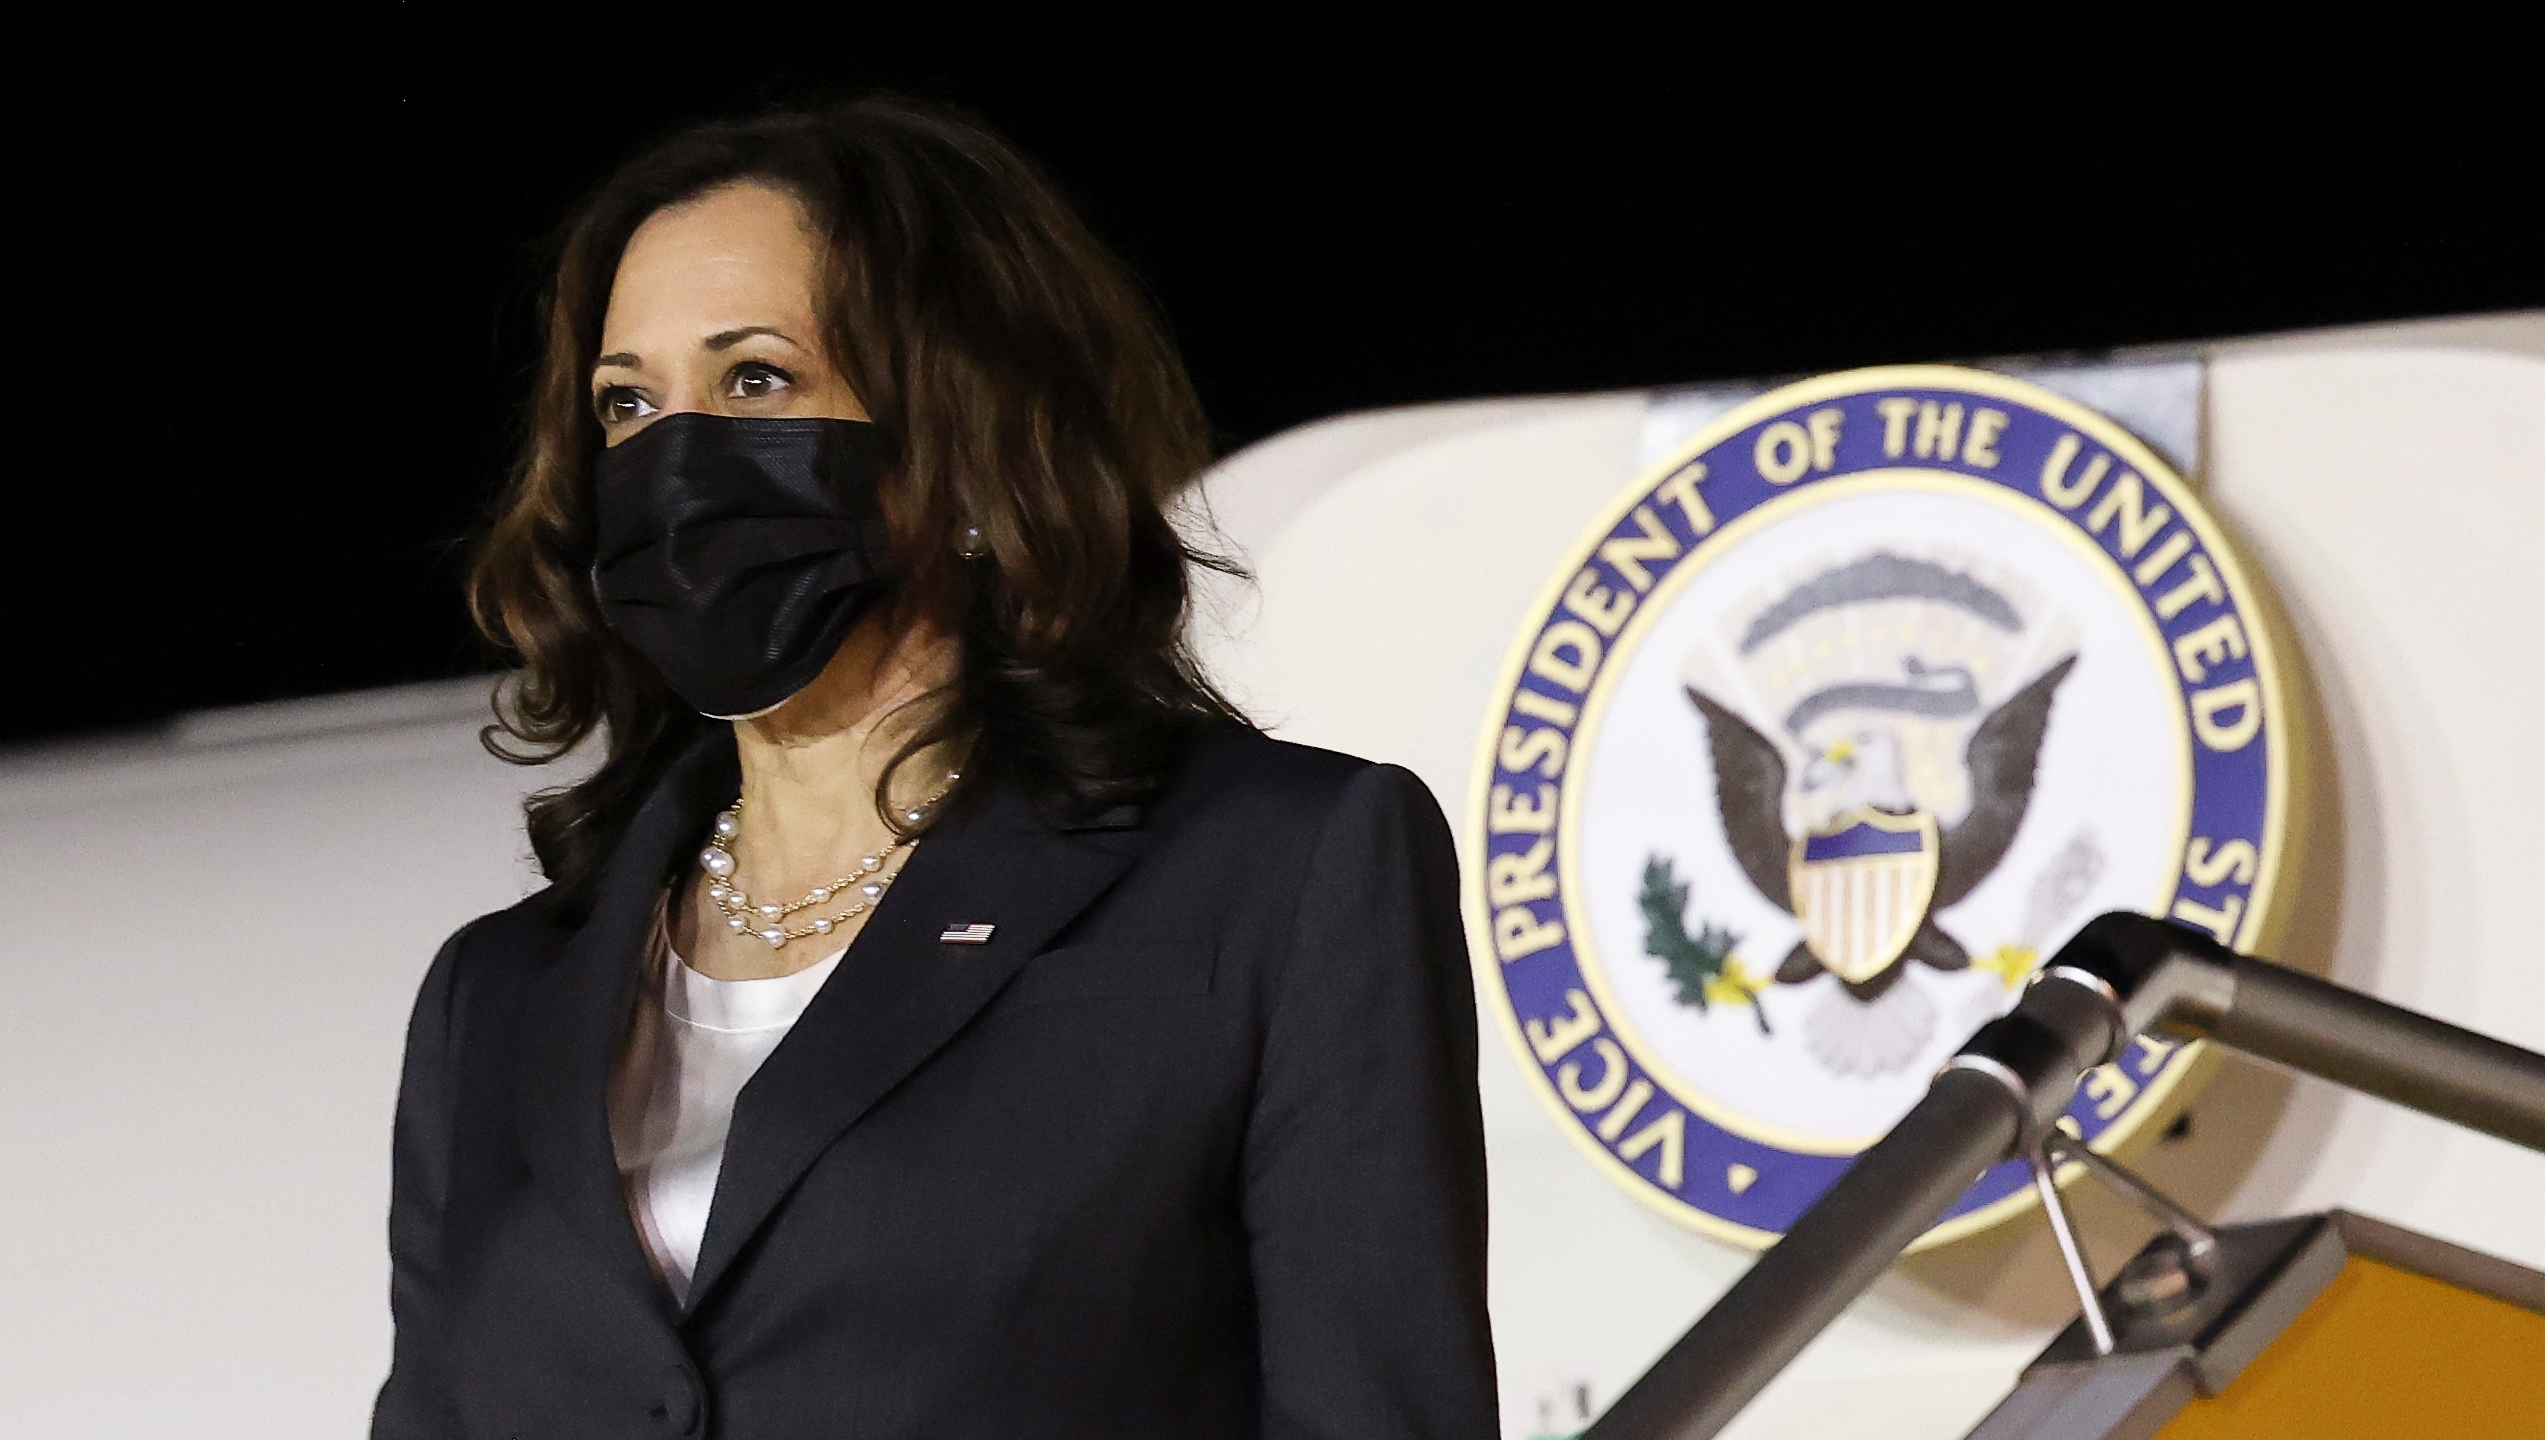 U.S. Vice President Kamala Harris arrives at the airport in Hanoi, Vietnam, Tuesday, Aug. 24, 2021. (Evelyn Hockstein/Pool Photo via AP)